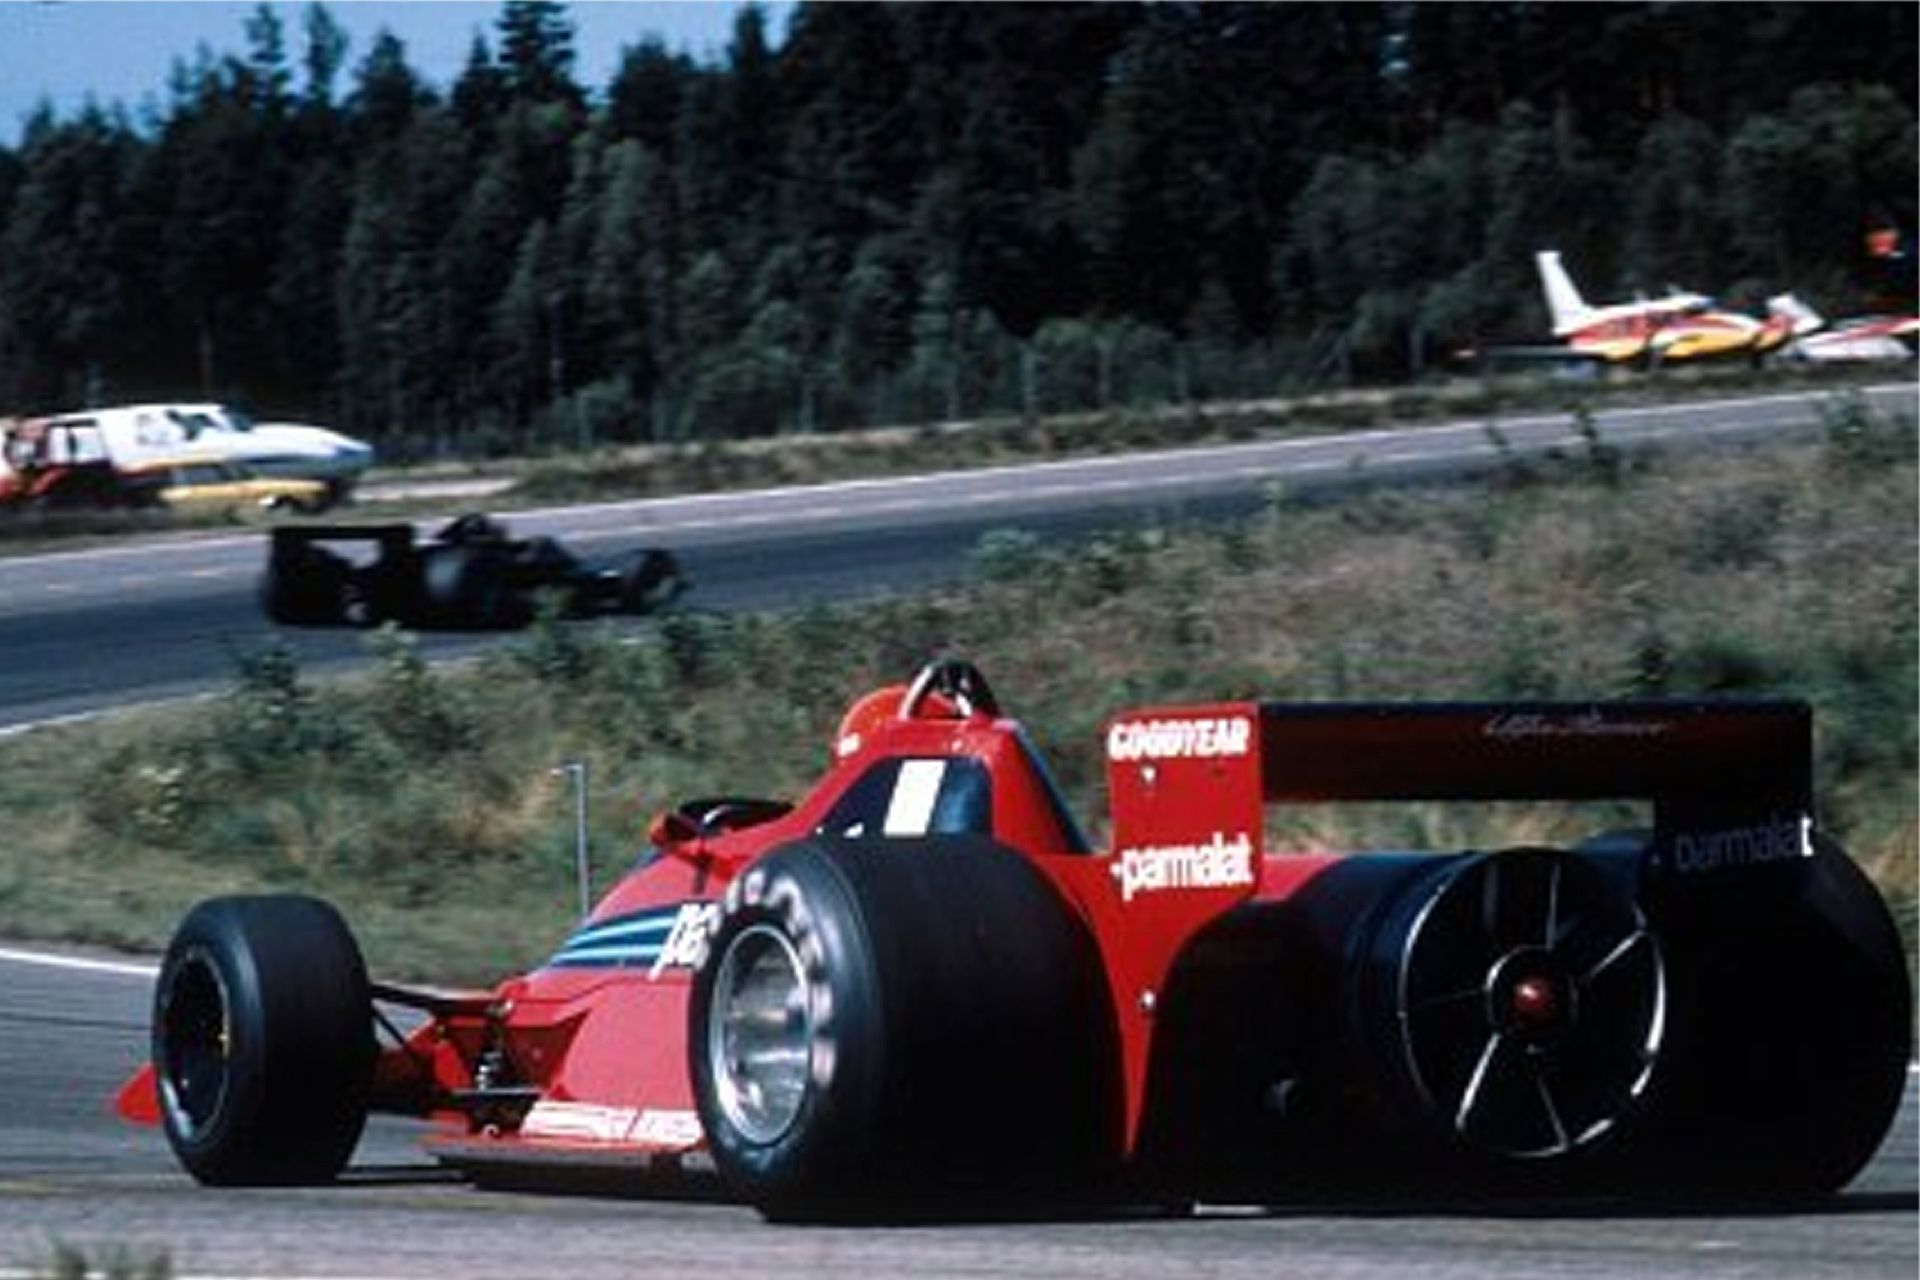 (0212)  Aquellos hermosos Brabham